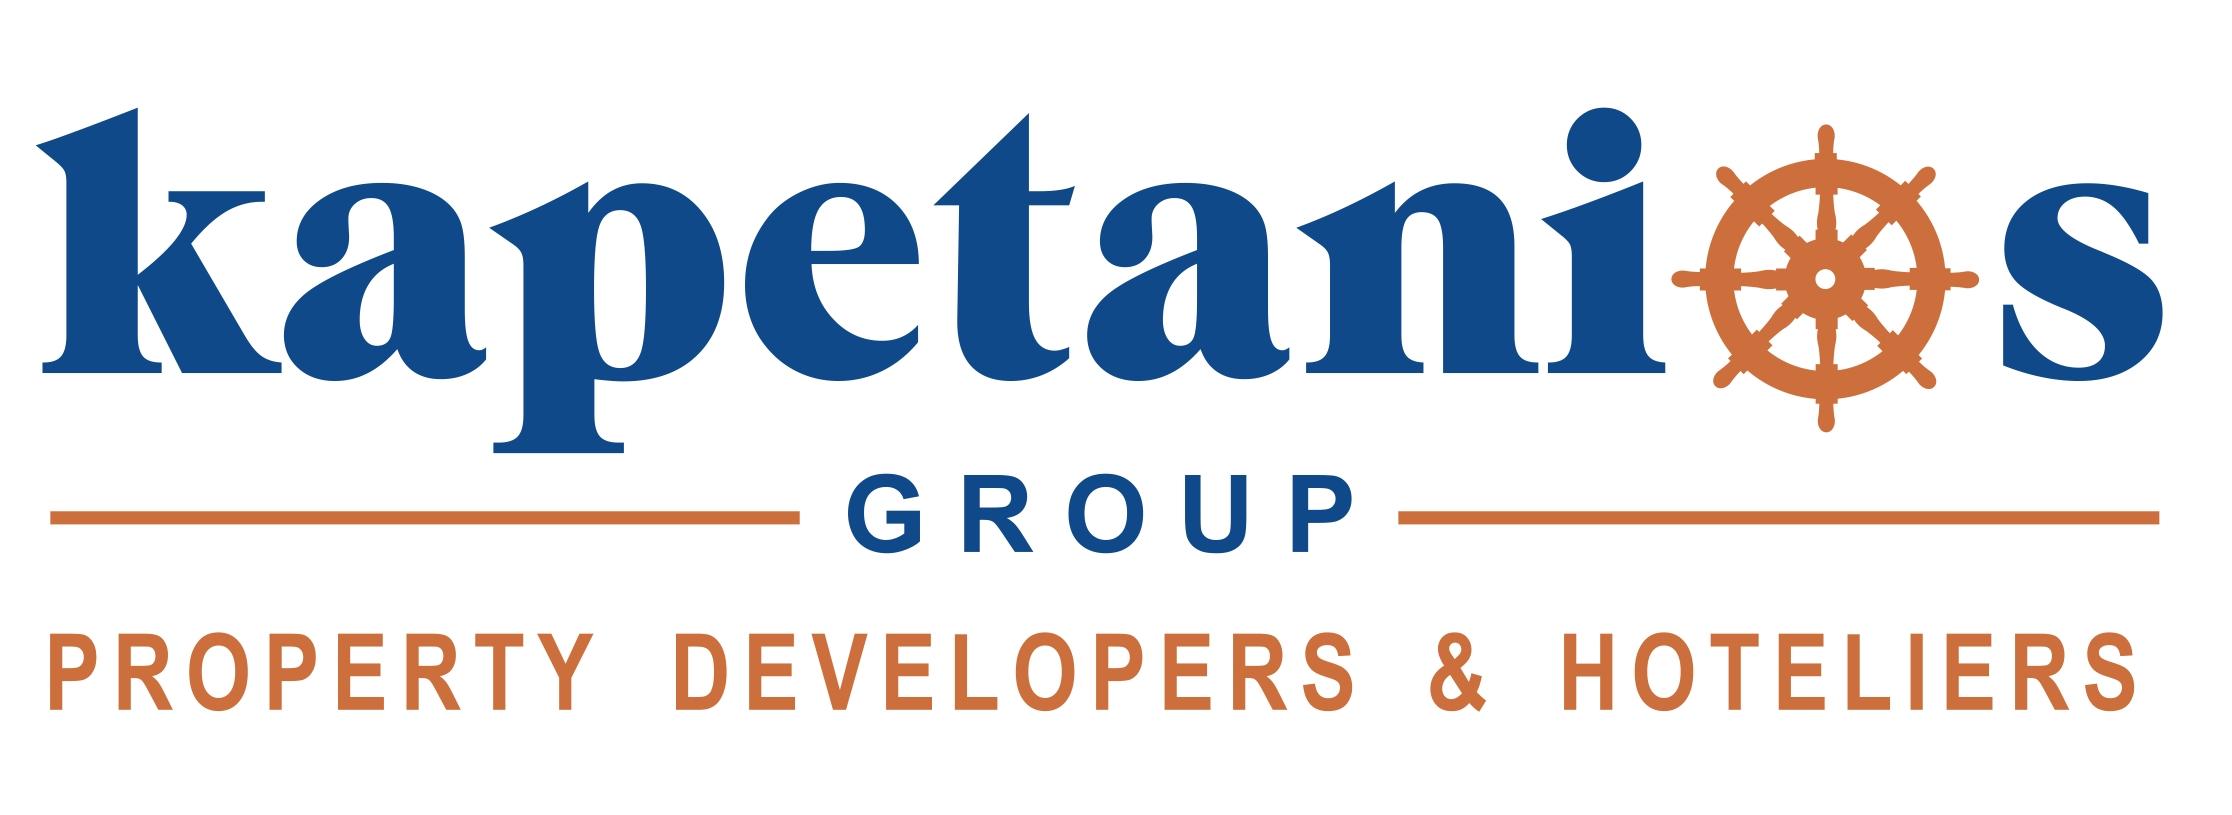 Kapetanios Group | Property Developers & Hoteliers